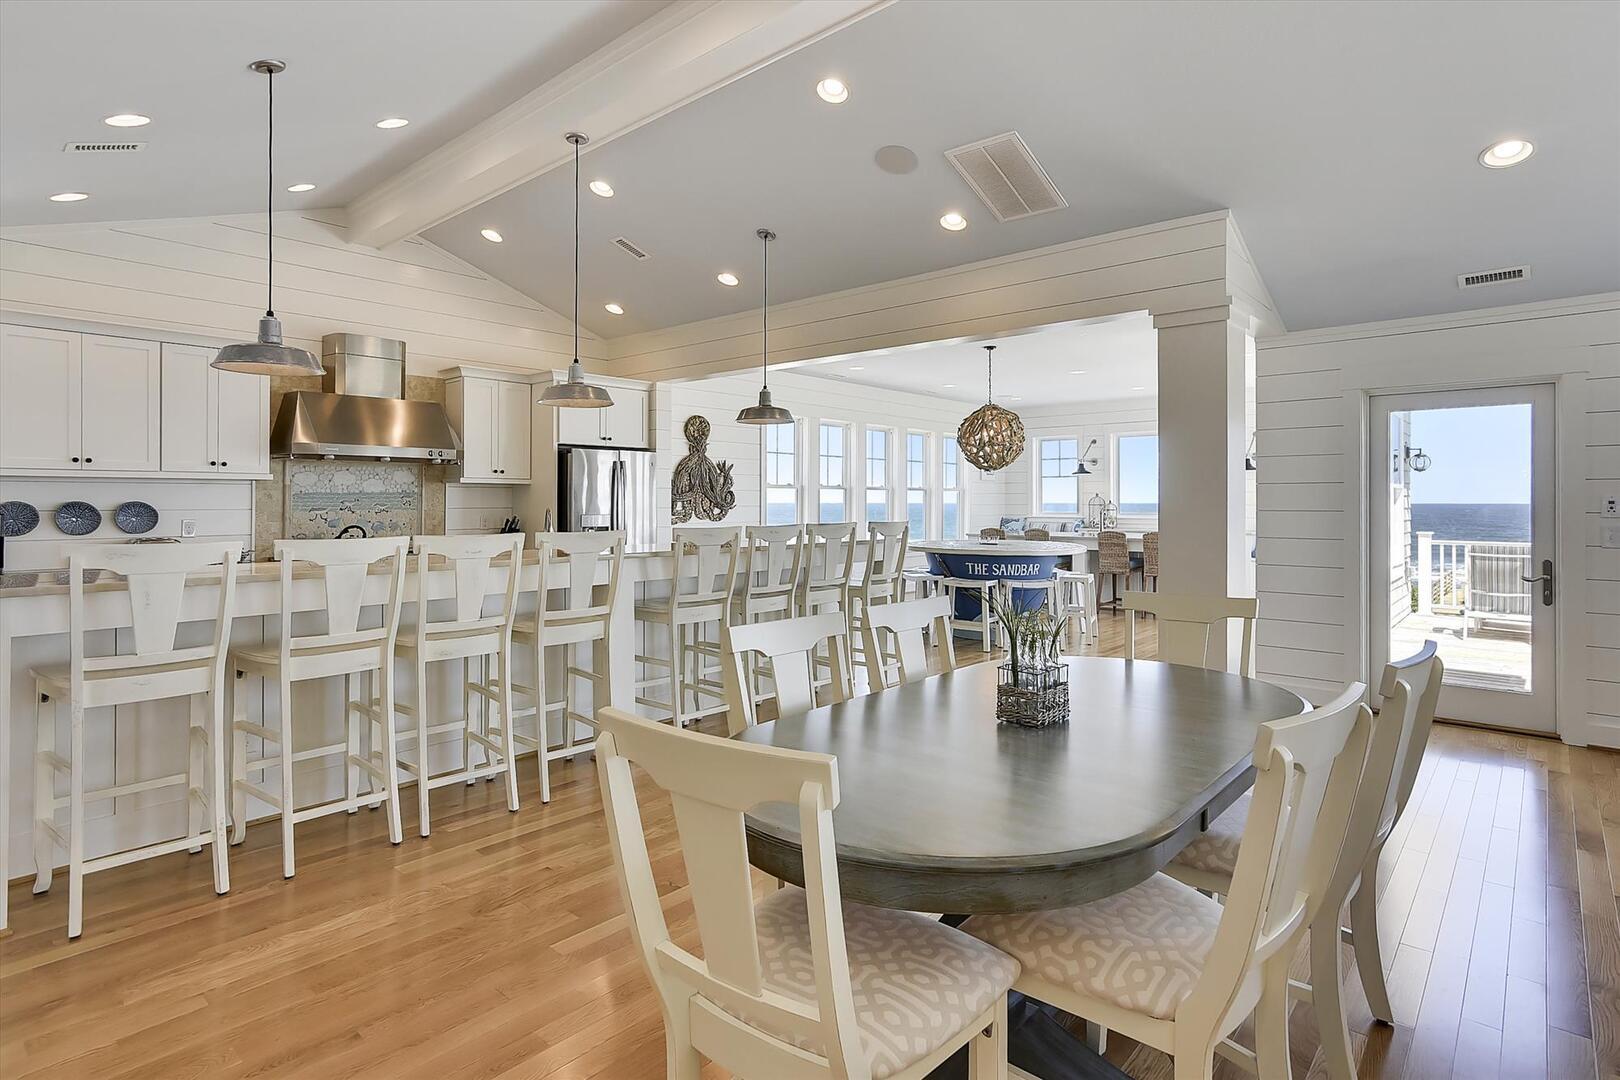 Main/Upper Level,Dining Area,